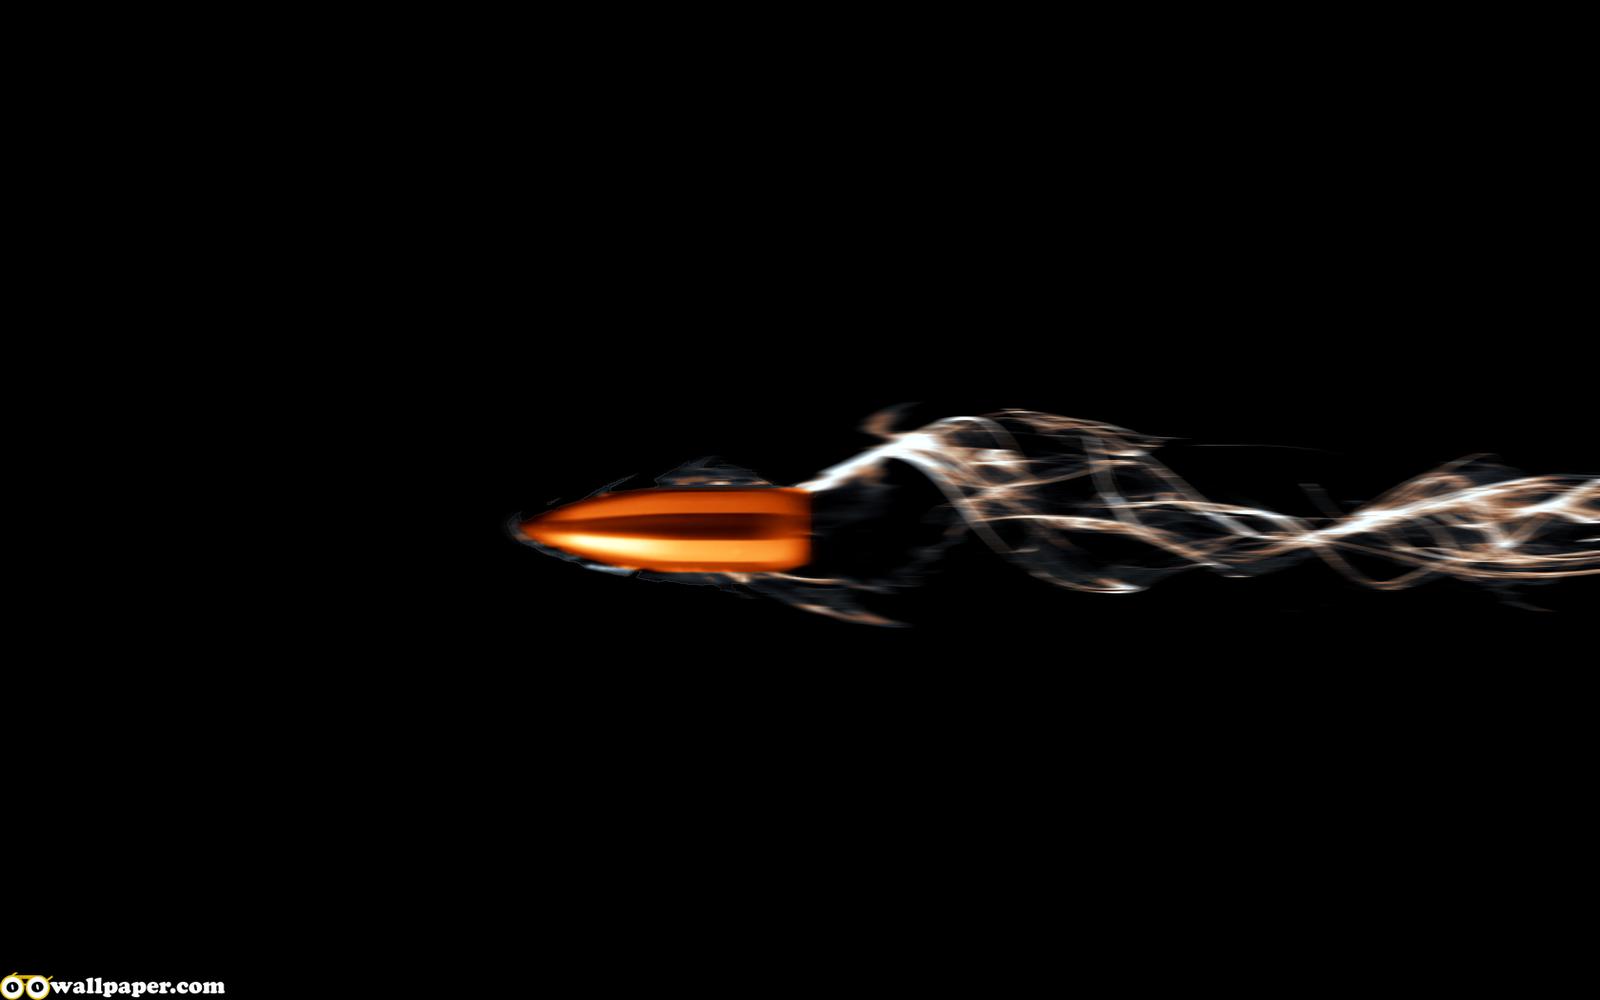 pic new posts: Wallpaper Bullet